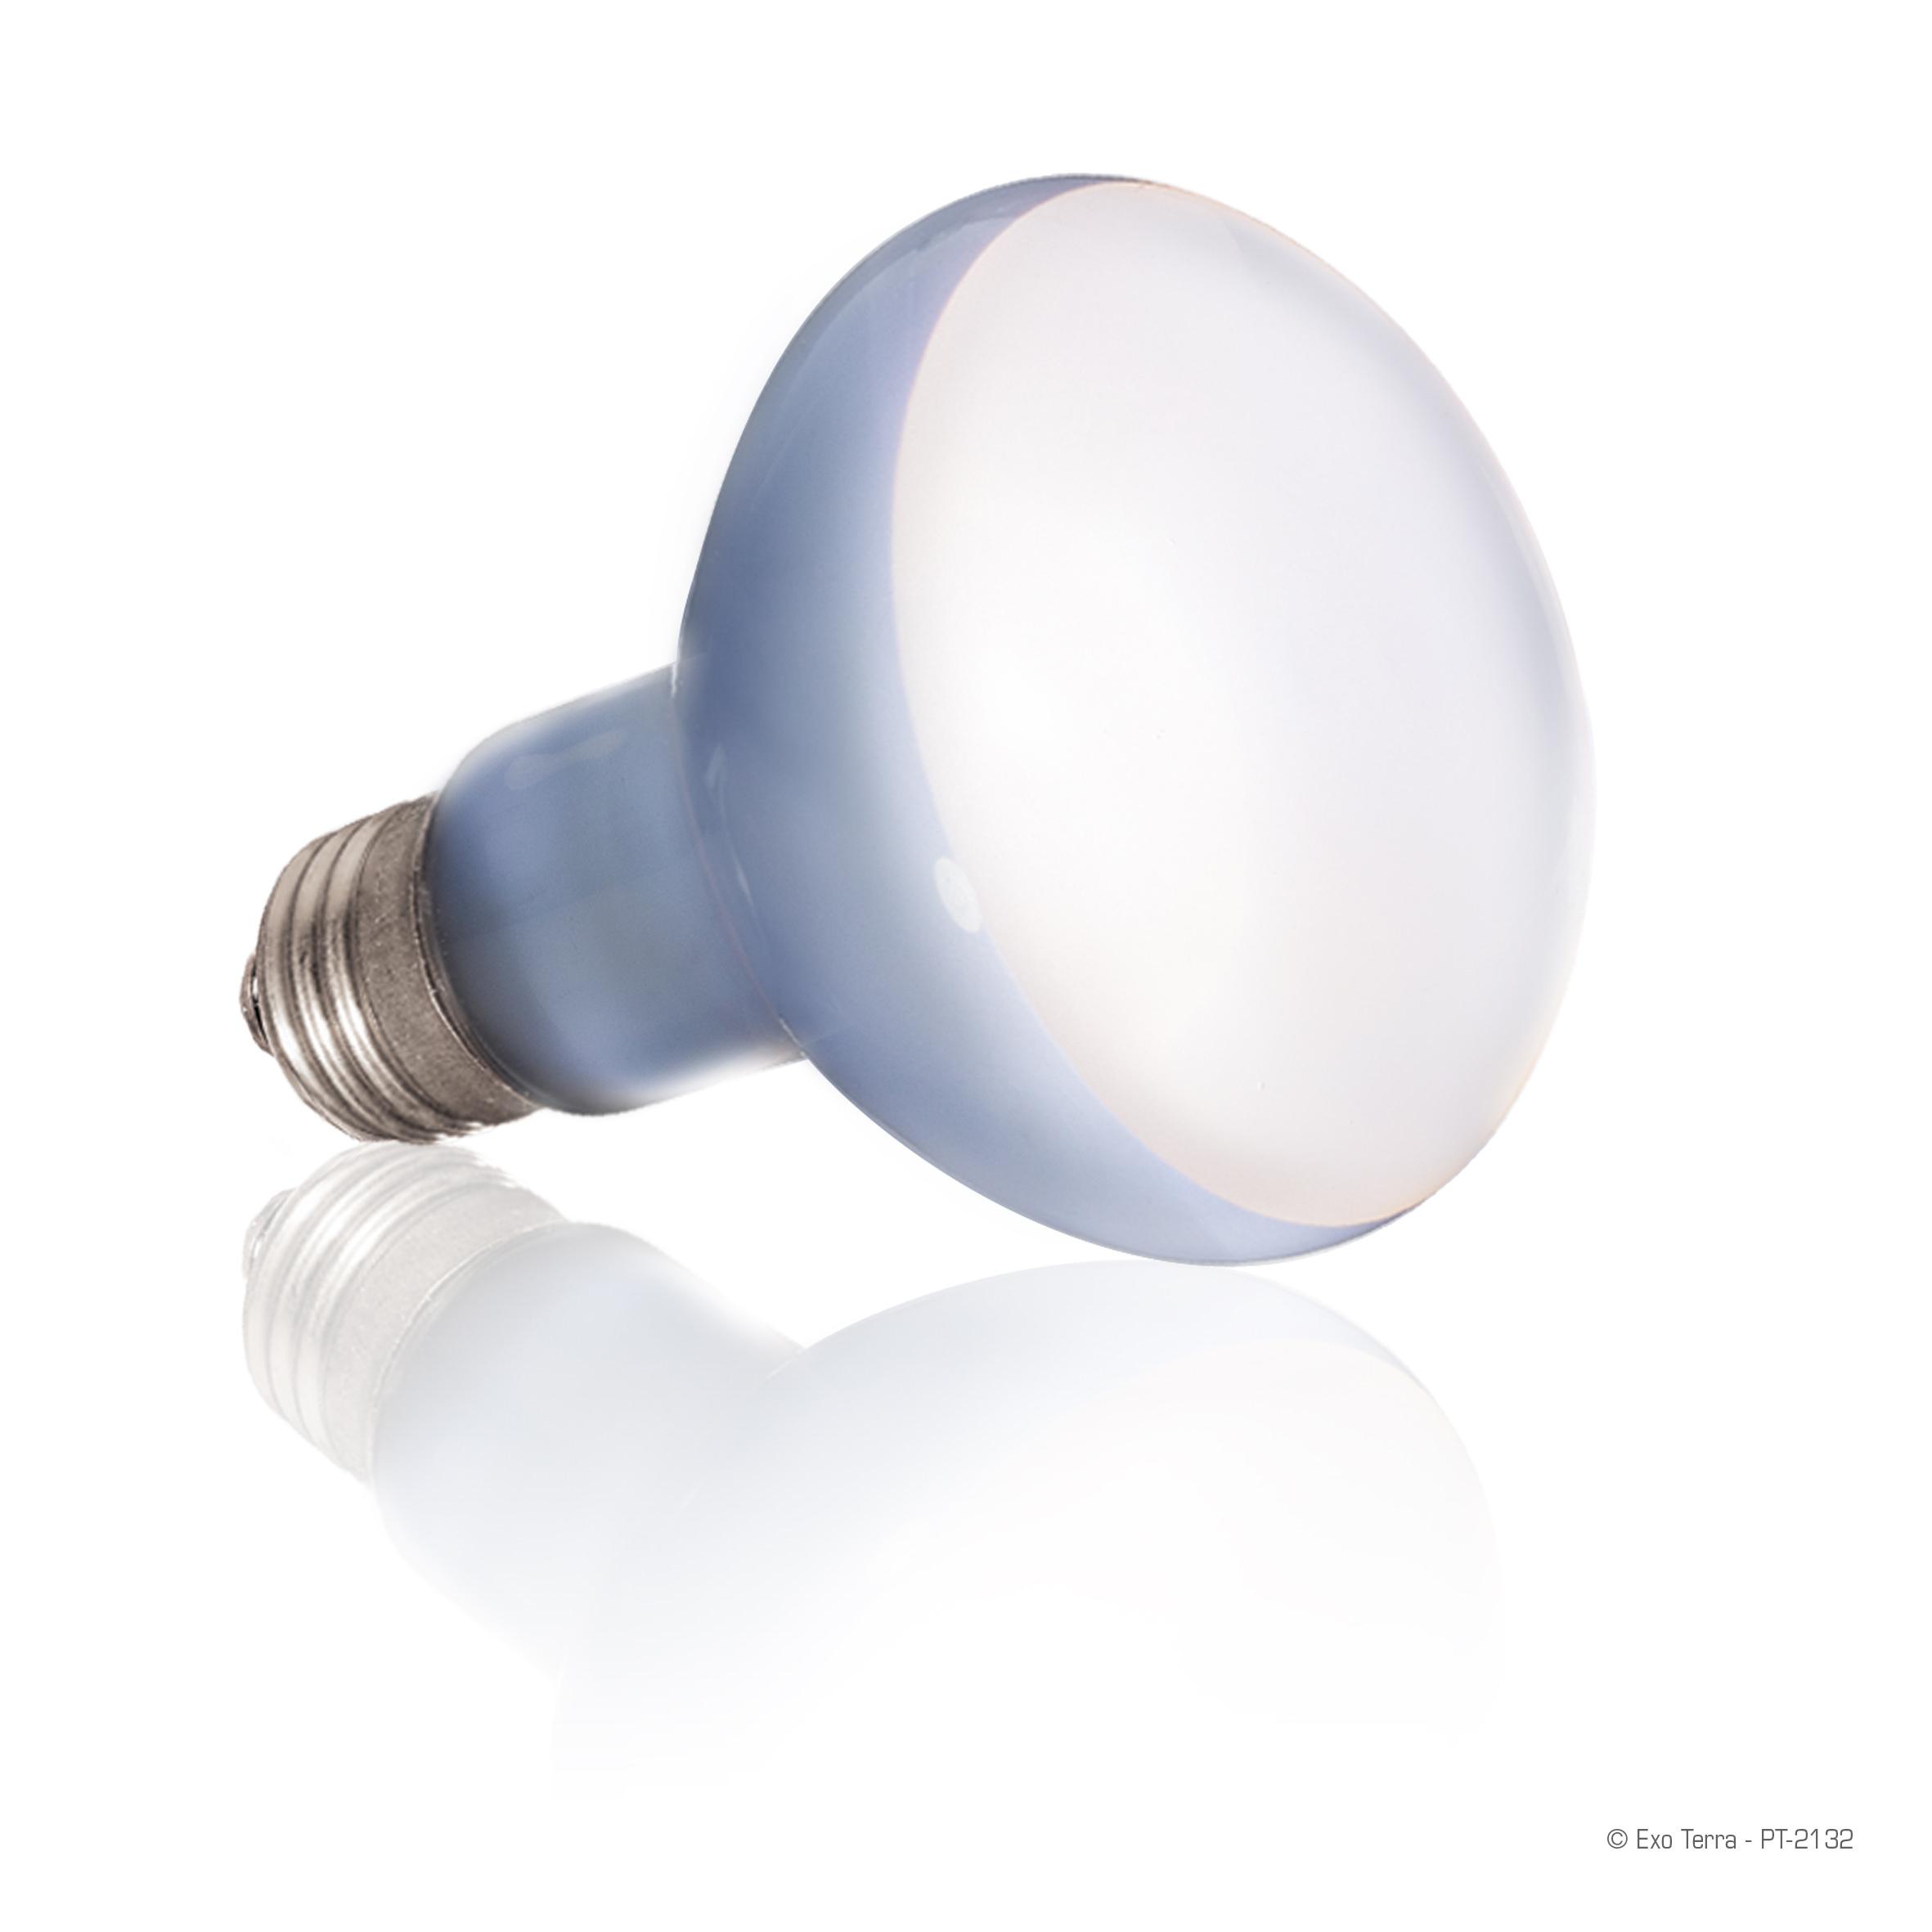 Exo Terra Daylight Basking Spot Lamp 75W - Walmart.com - Walmart.com